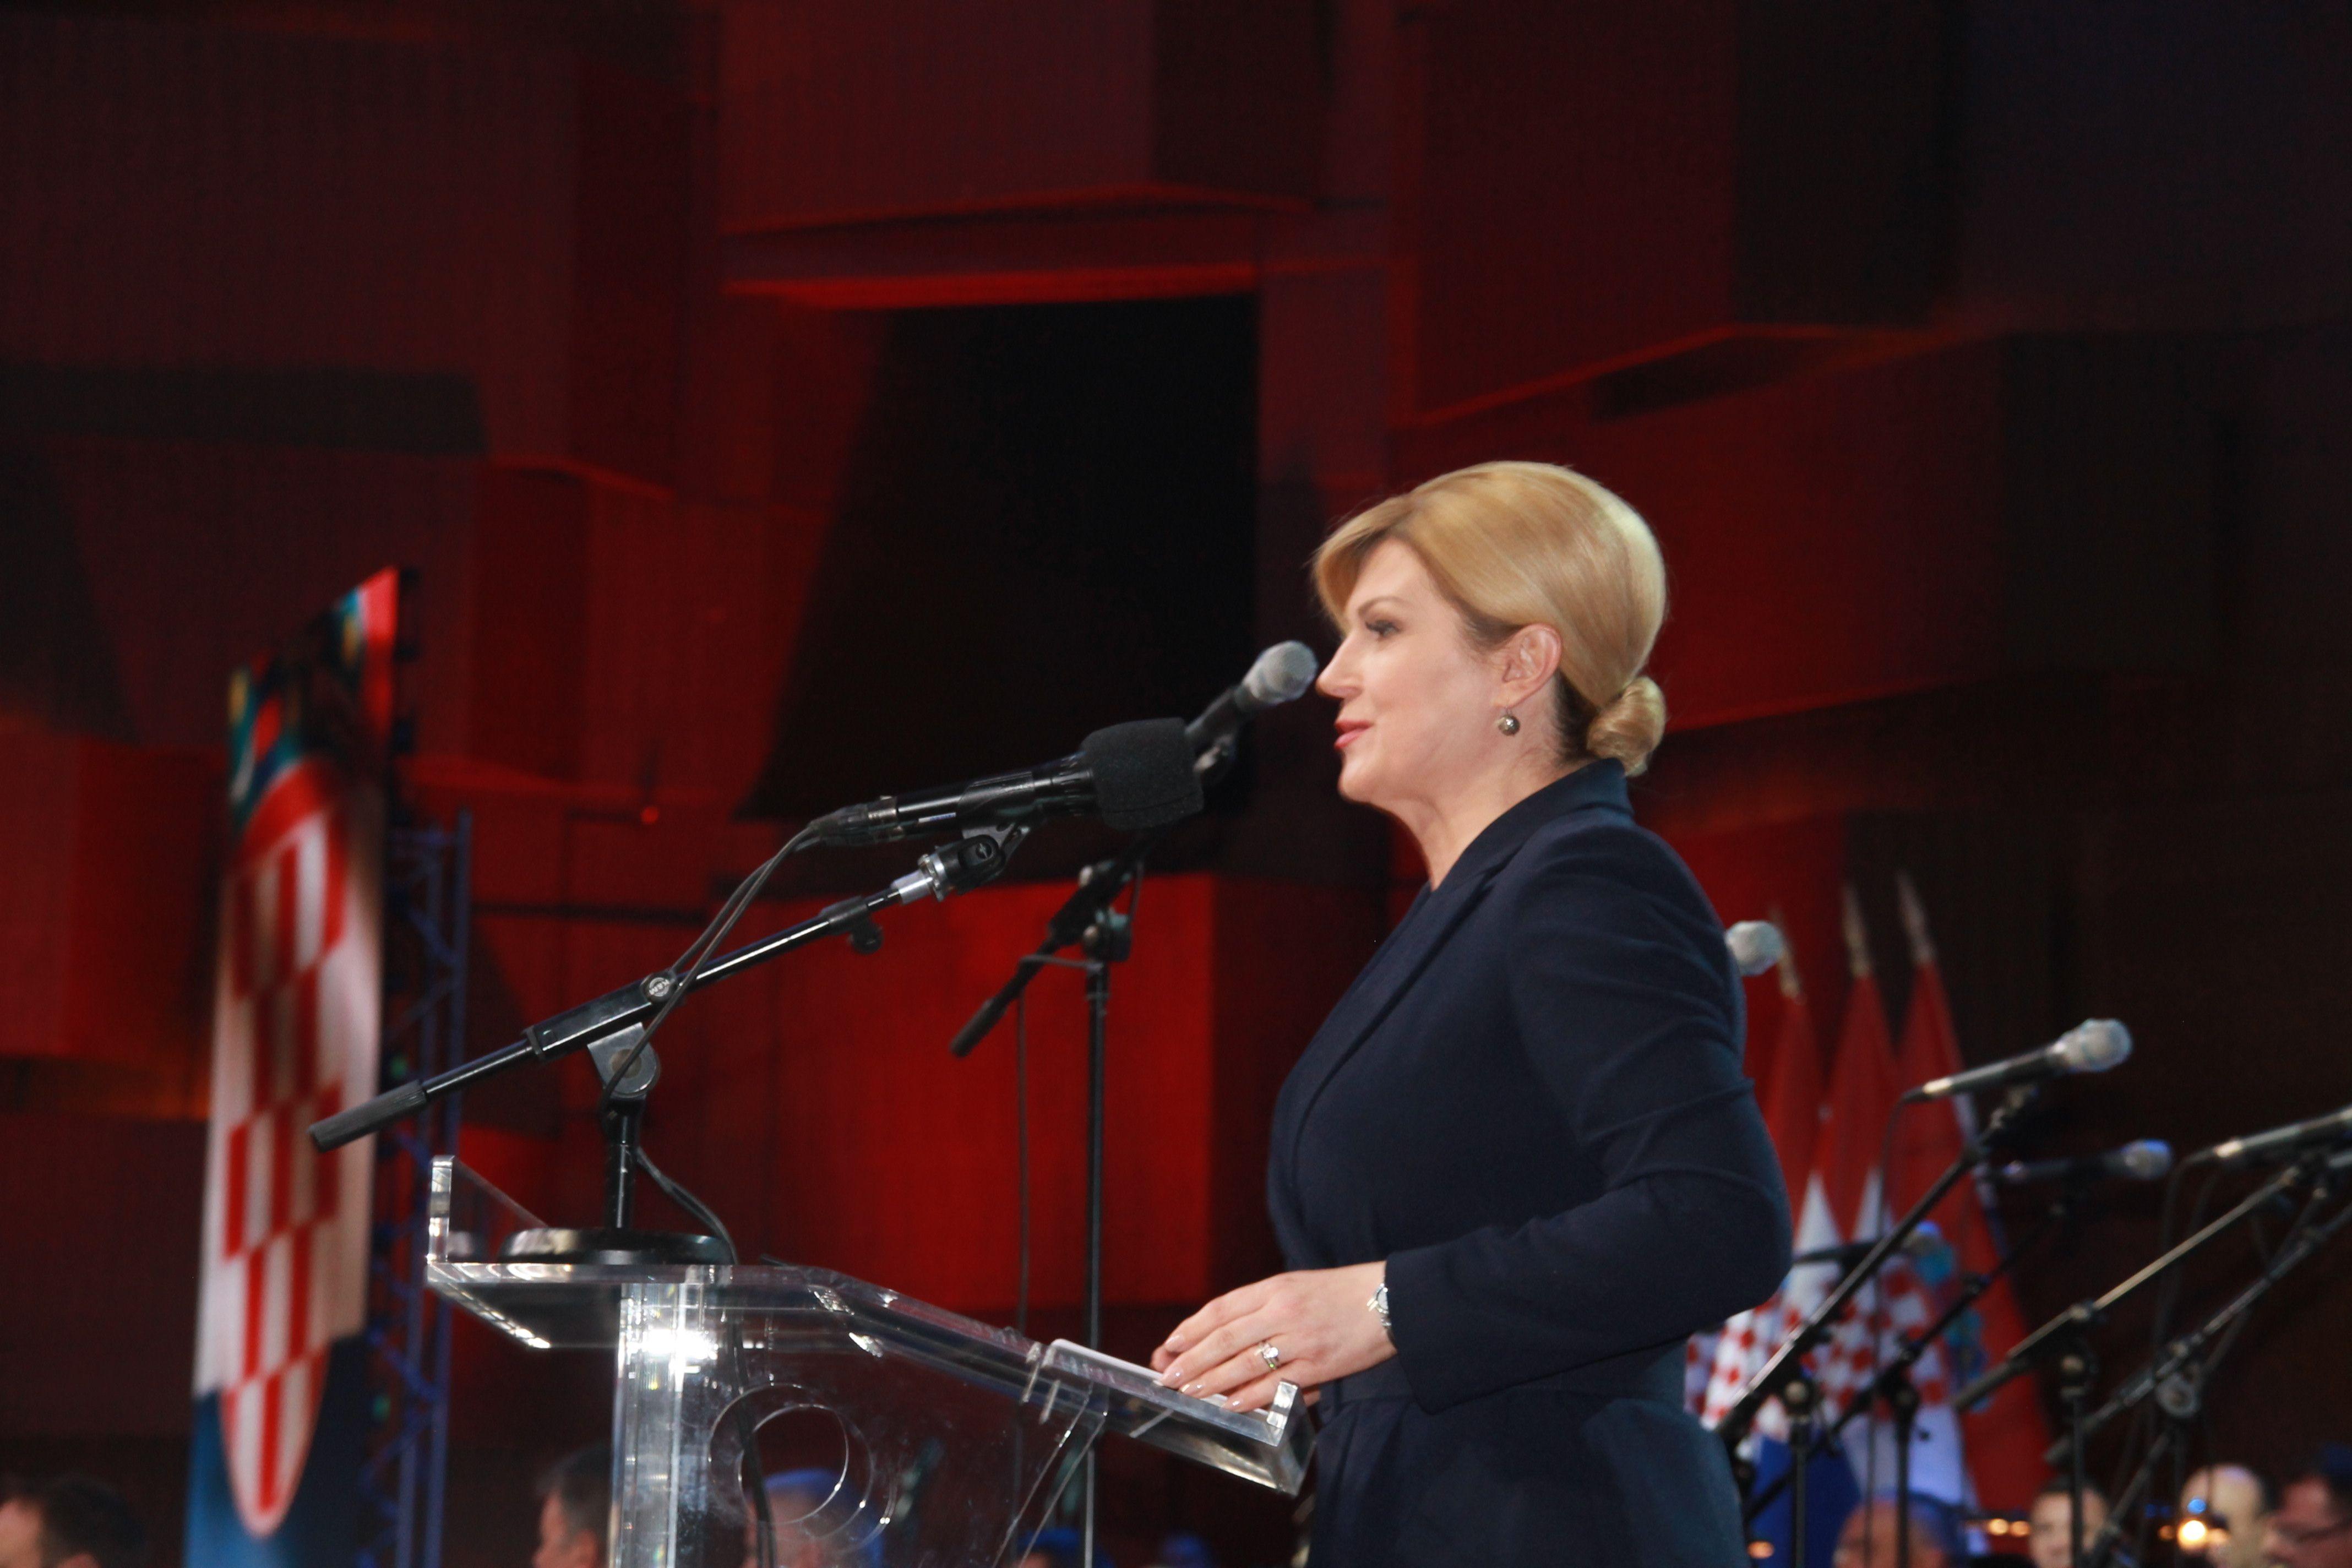 Čestitka predsjednice Grabar-Kitarović za Dan Oružanih snaga,  Dan Hrvatske kopnene vojske i 28. obljetnicu ustrojavanja Hrvatske vojske